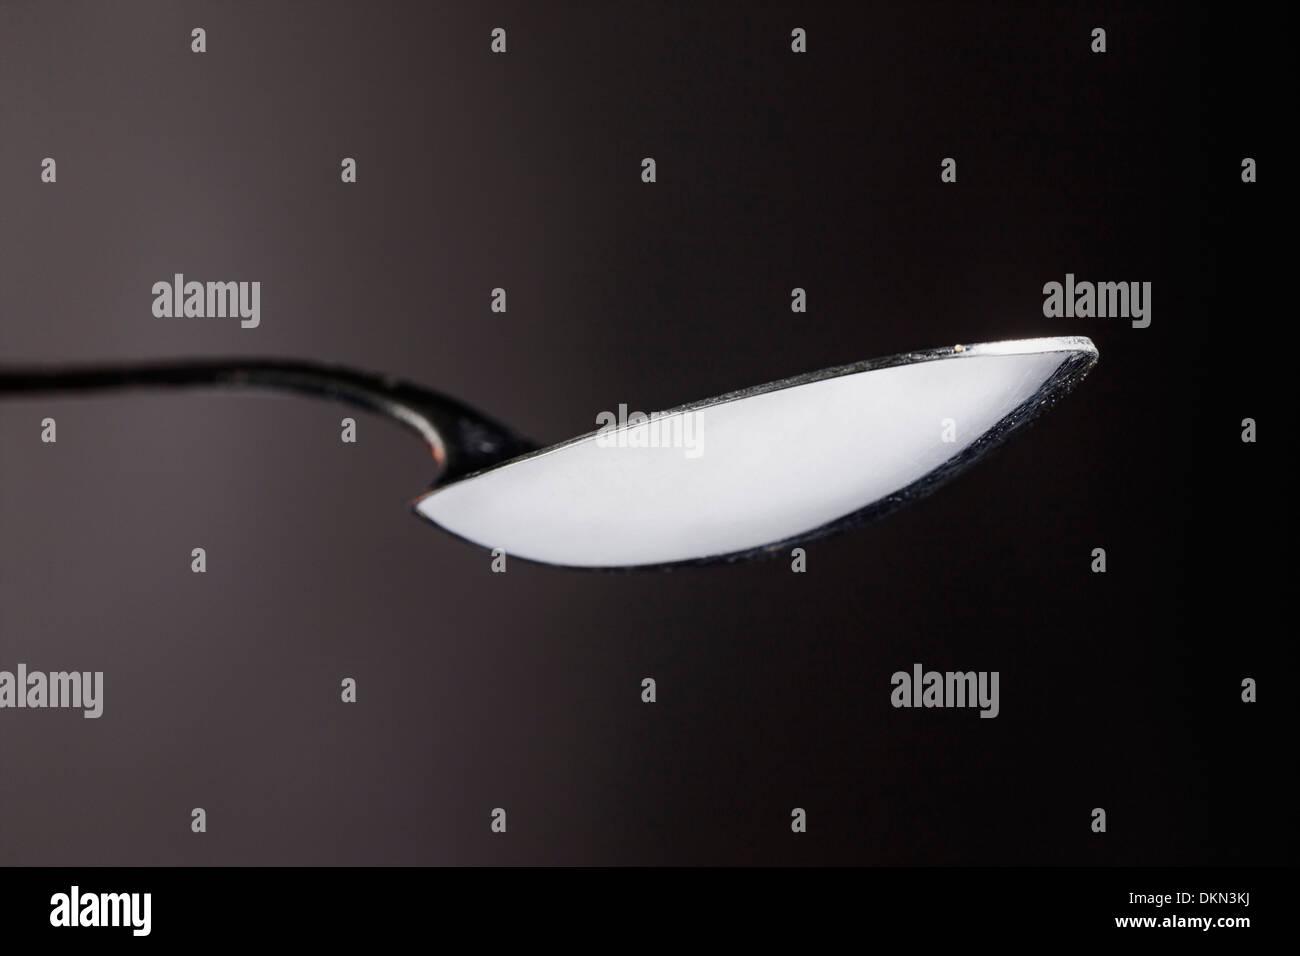 Studio photograph of flatware spoon - Stock Image